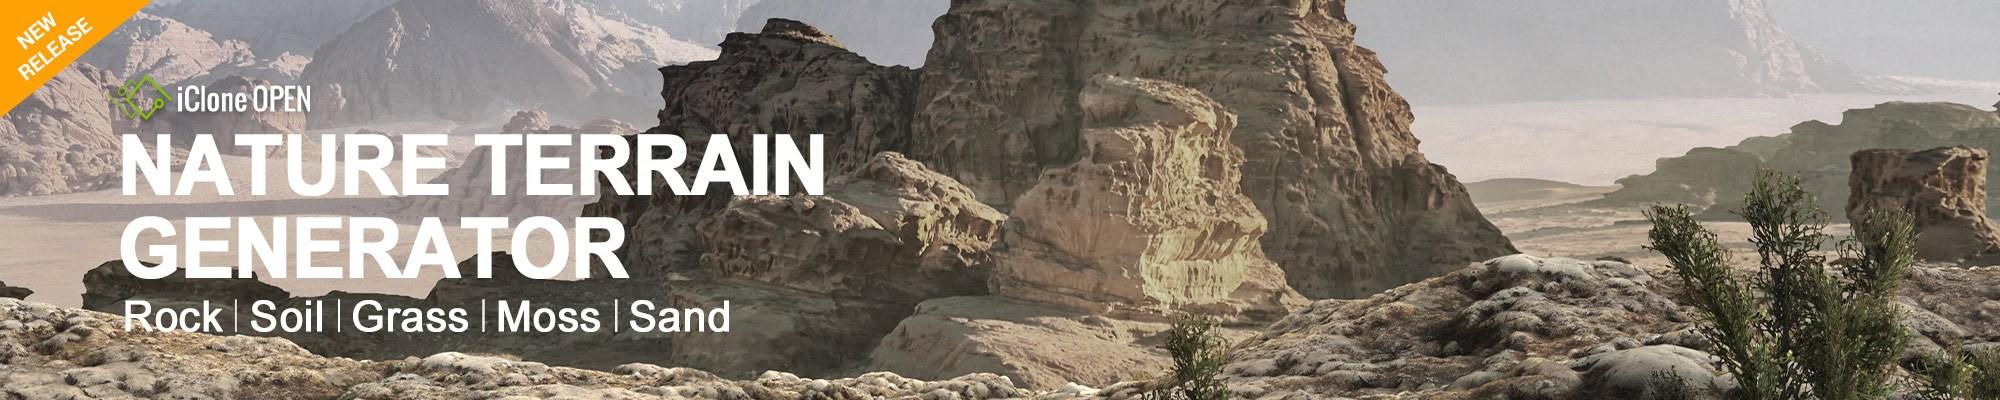 Nature Terrain Generator - Create Your Own Limitless Photorealistic Terrains